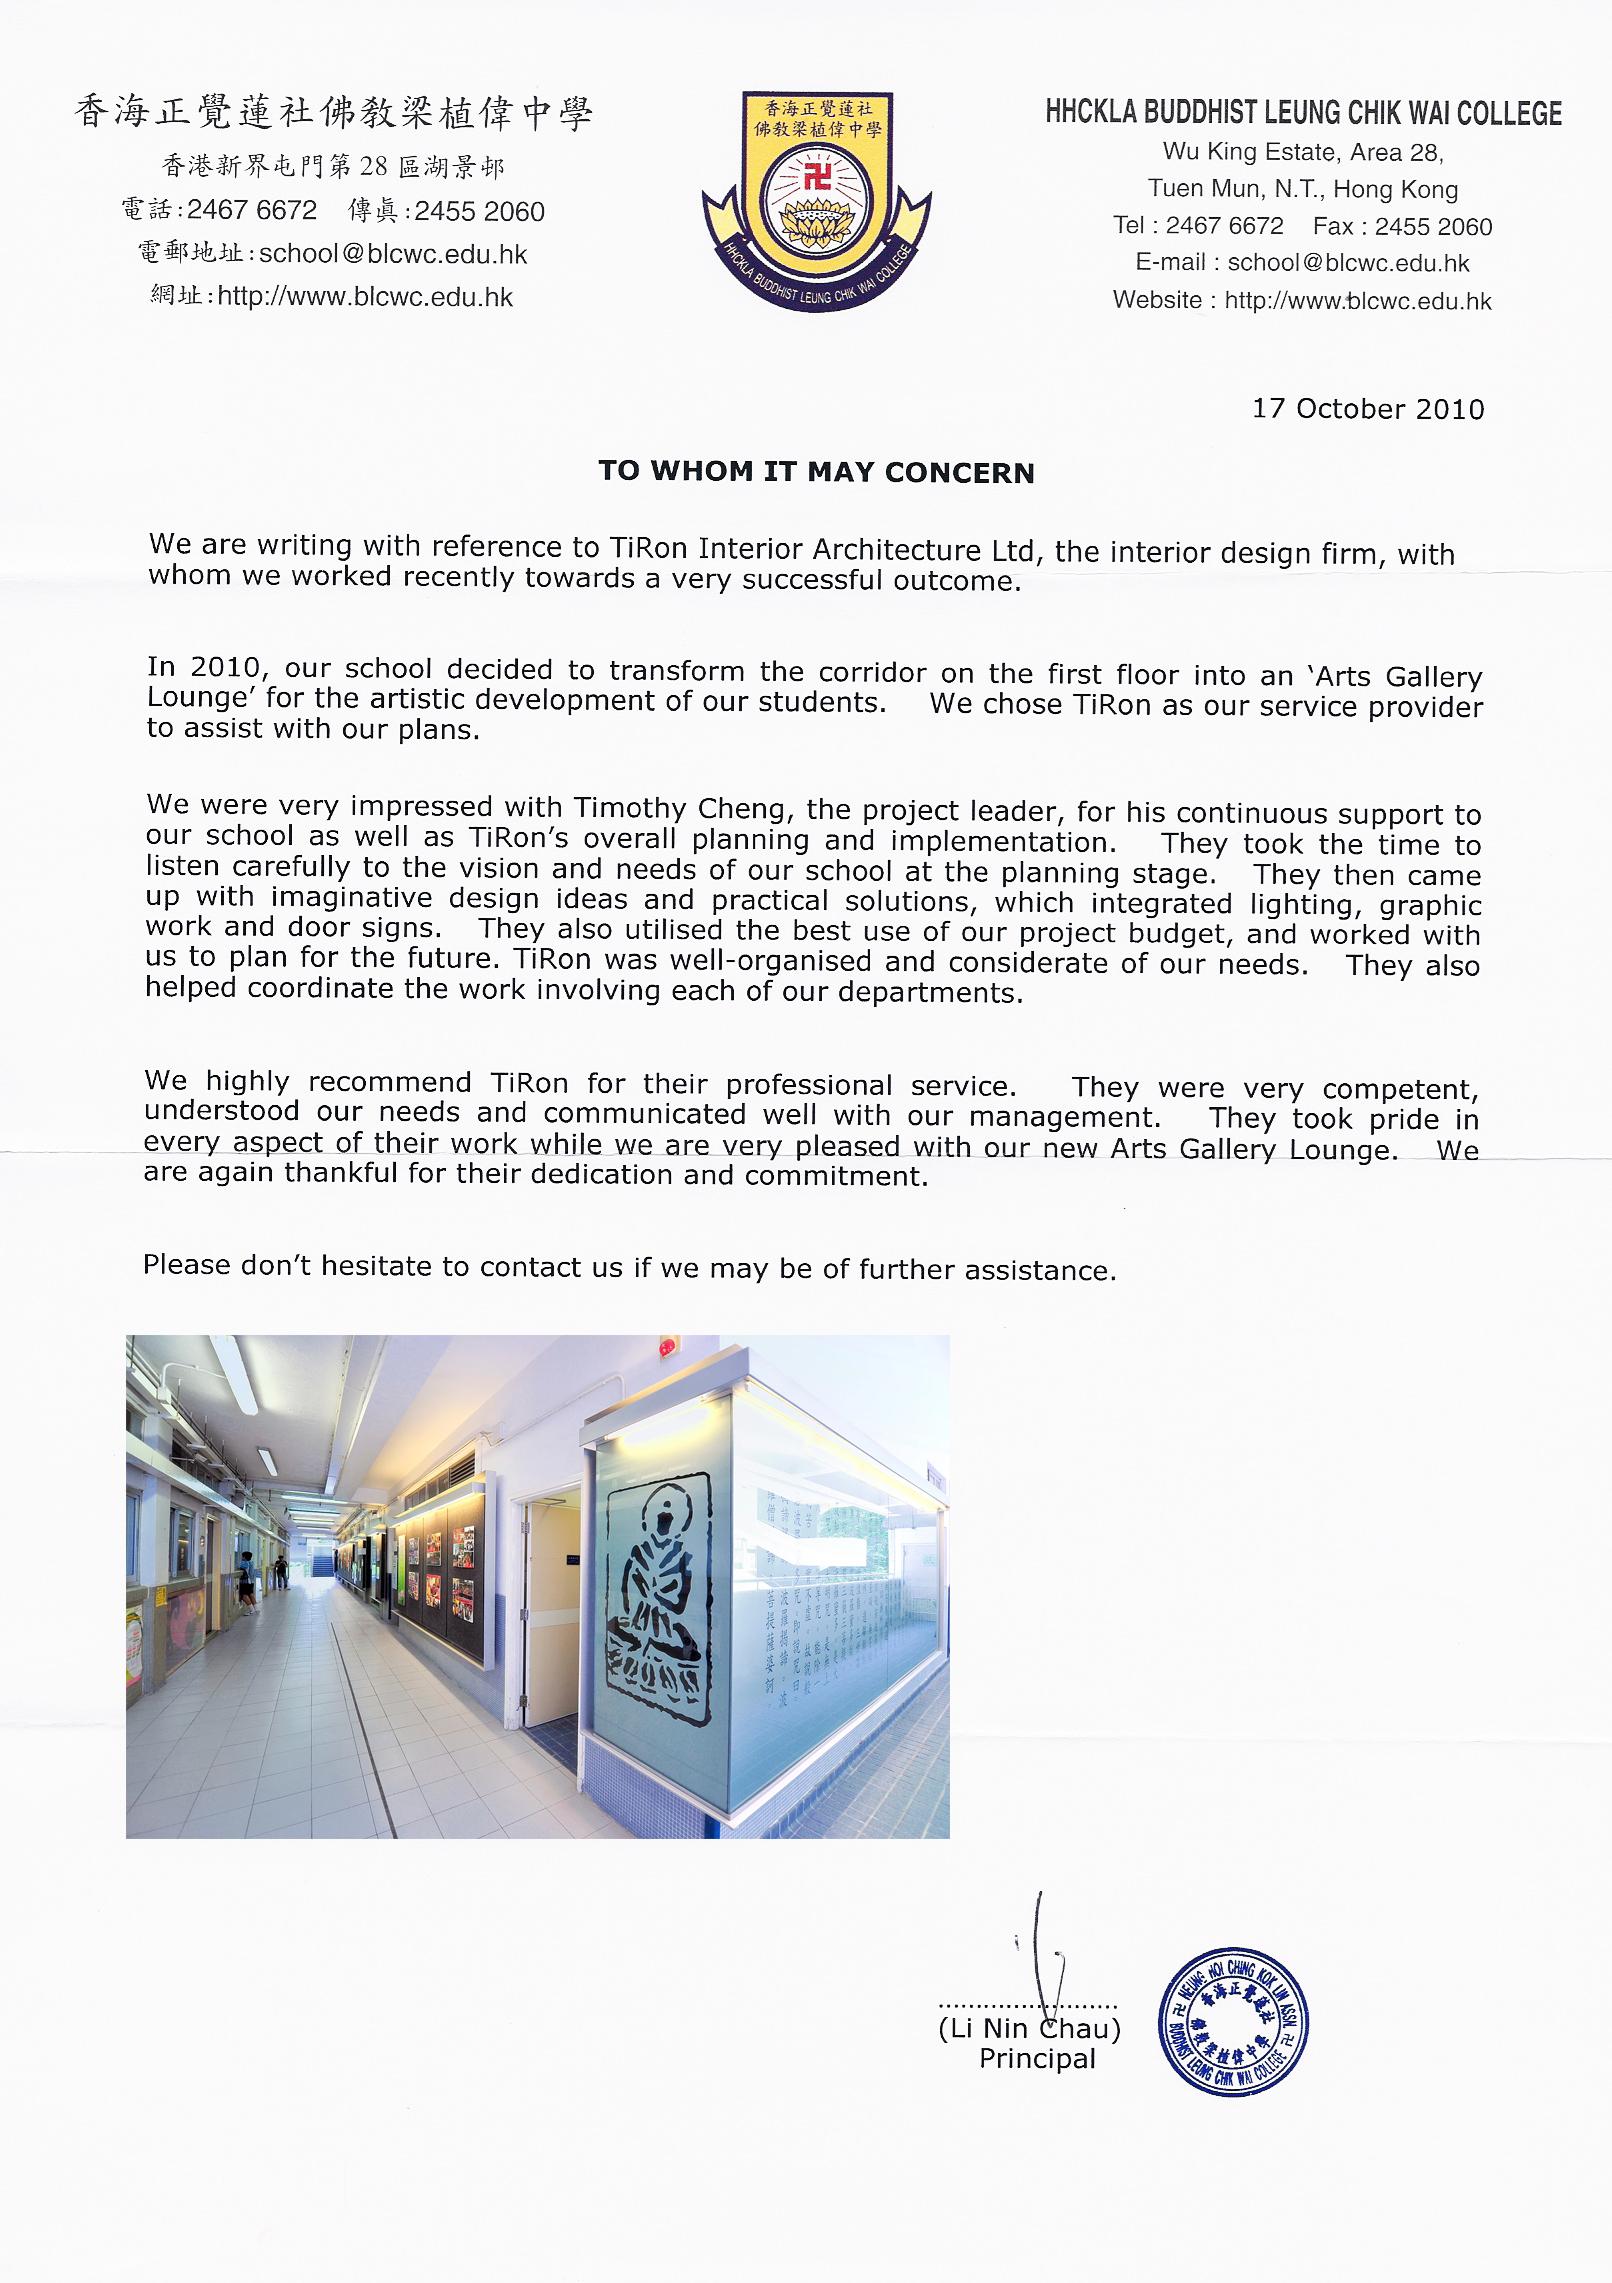 Signed Reference Letter (HHCKLA Buddhist